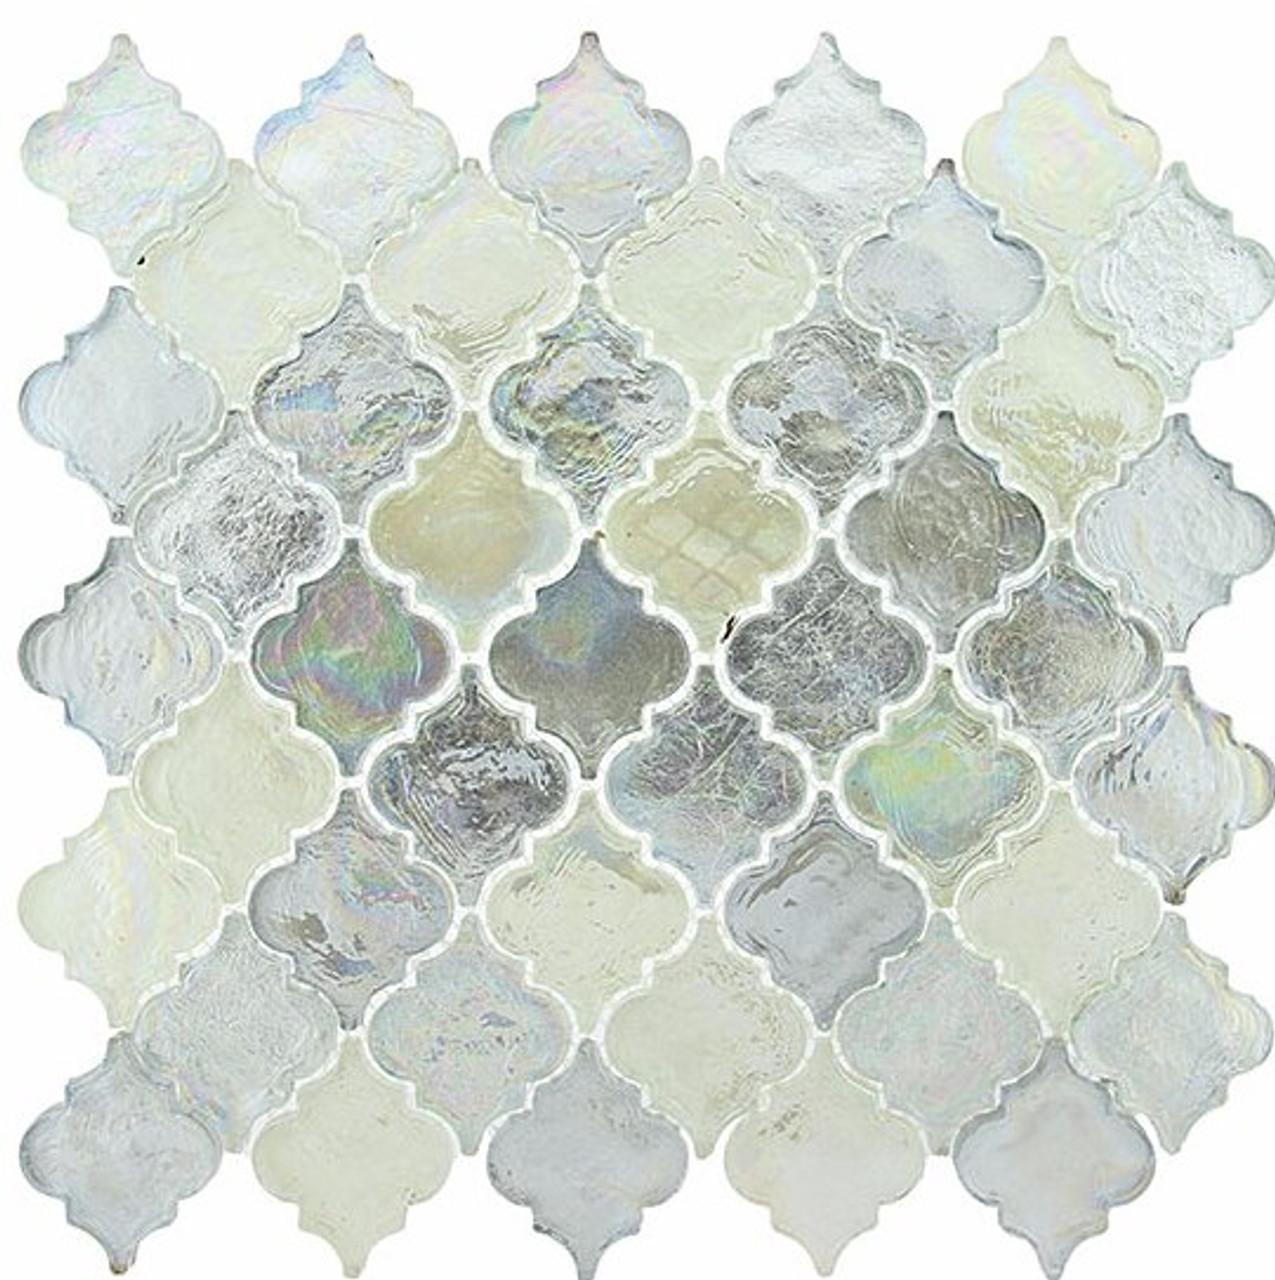 Bella Glass Tiles Dentelle Series April Shower Glass Mosaic